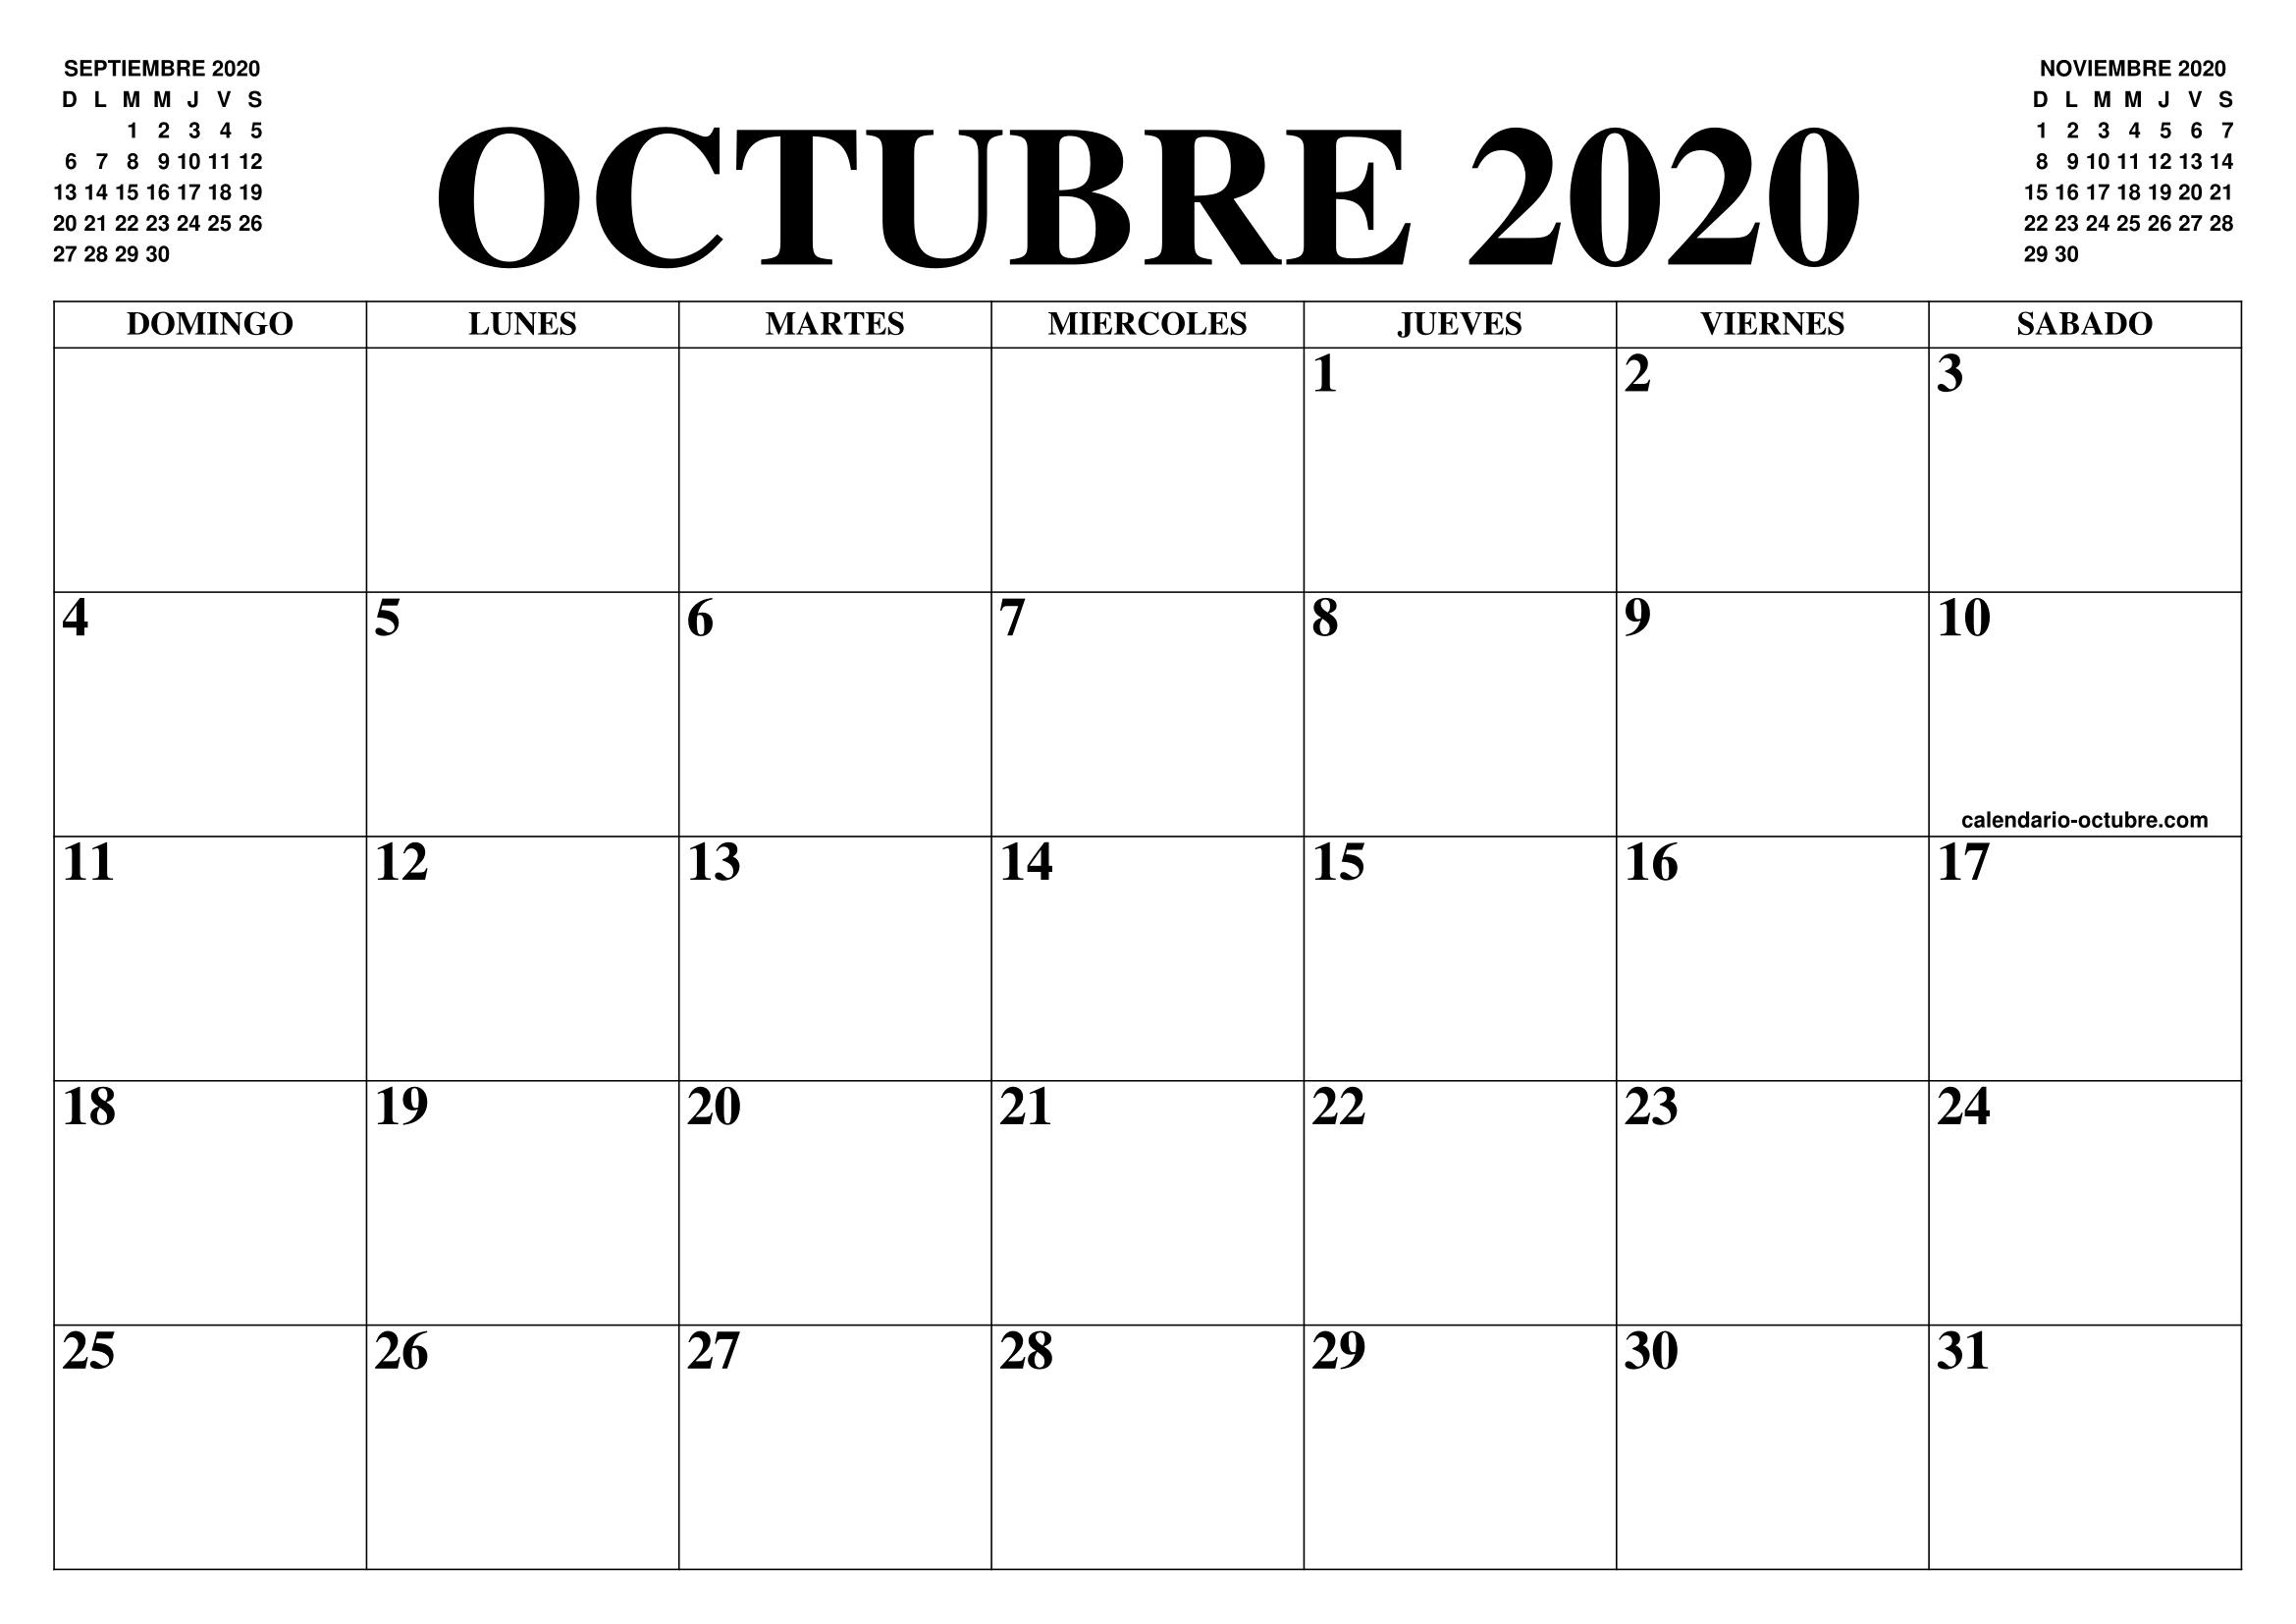 Calendario Agenda 2020 Para Imprimir.Calendario Octubre 2020 El Calendario Octubre Para